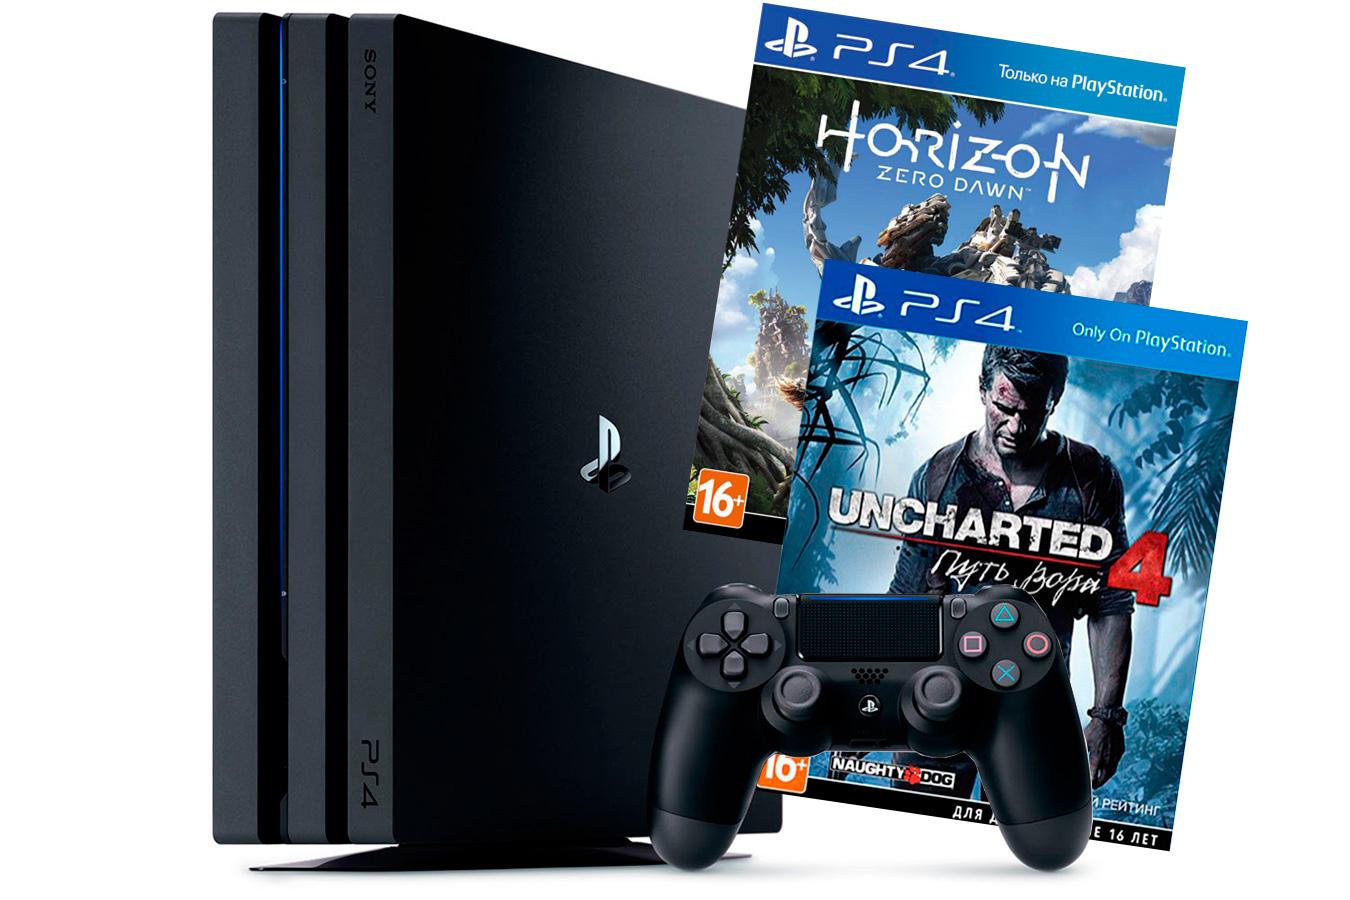 PlayStation 4 Pro с играми Horizon Zero Dawn и Uncharted 4 [PS4P1HUZ]